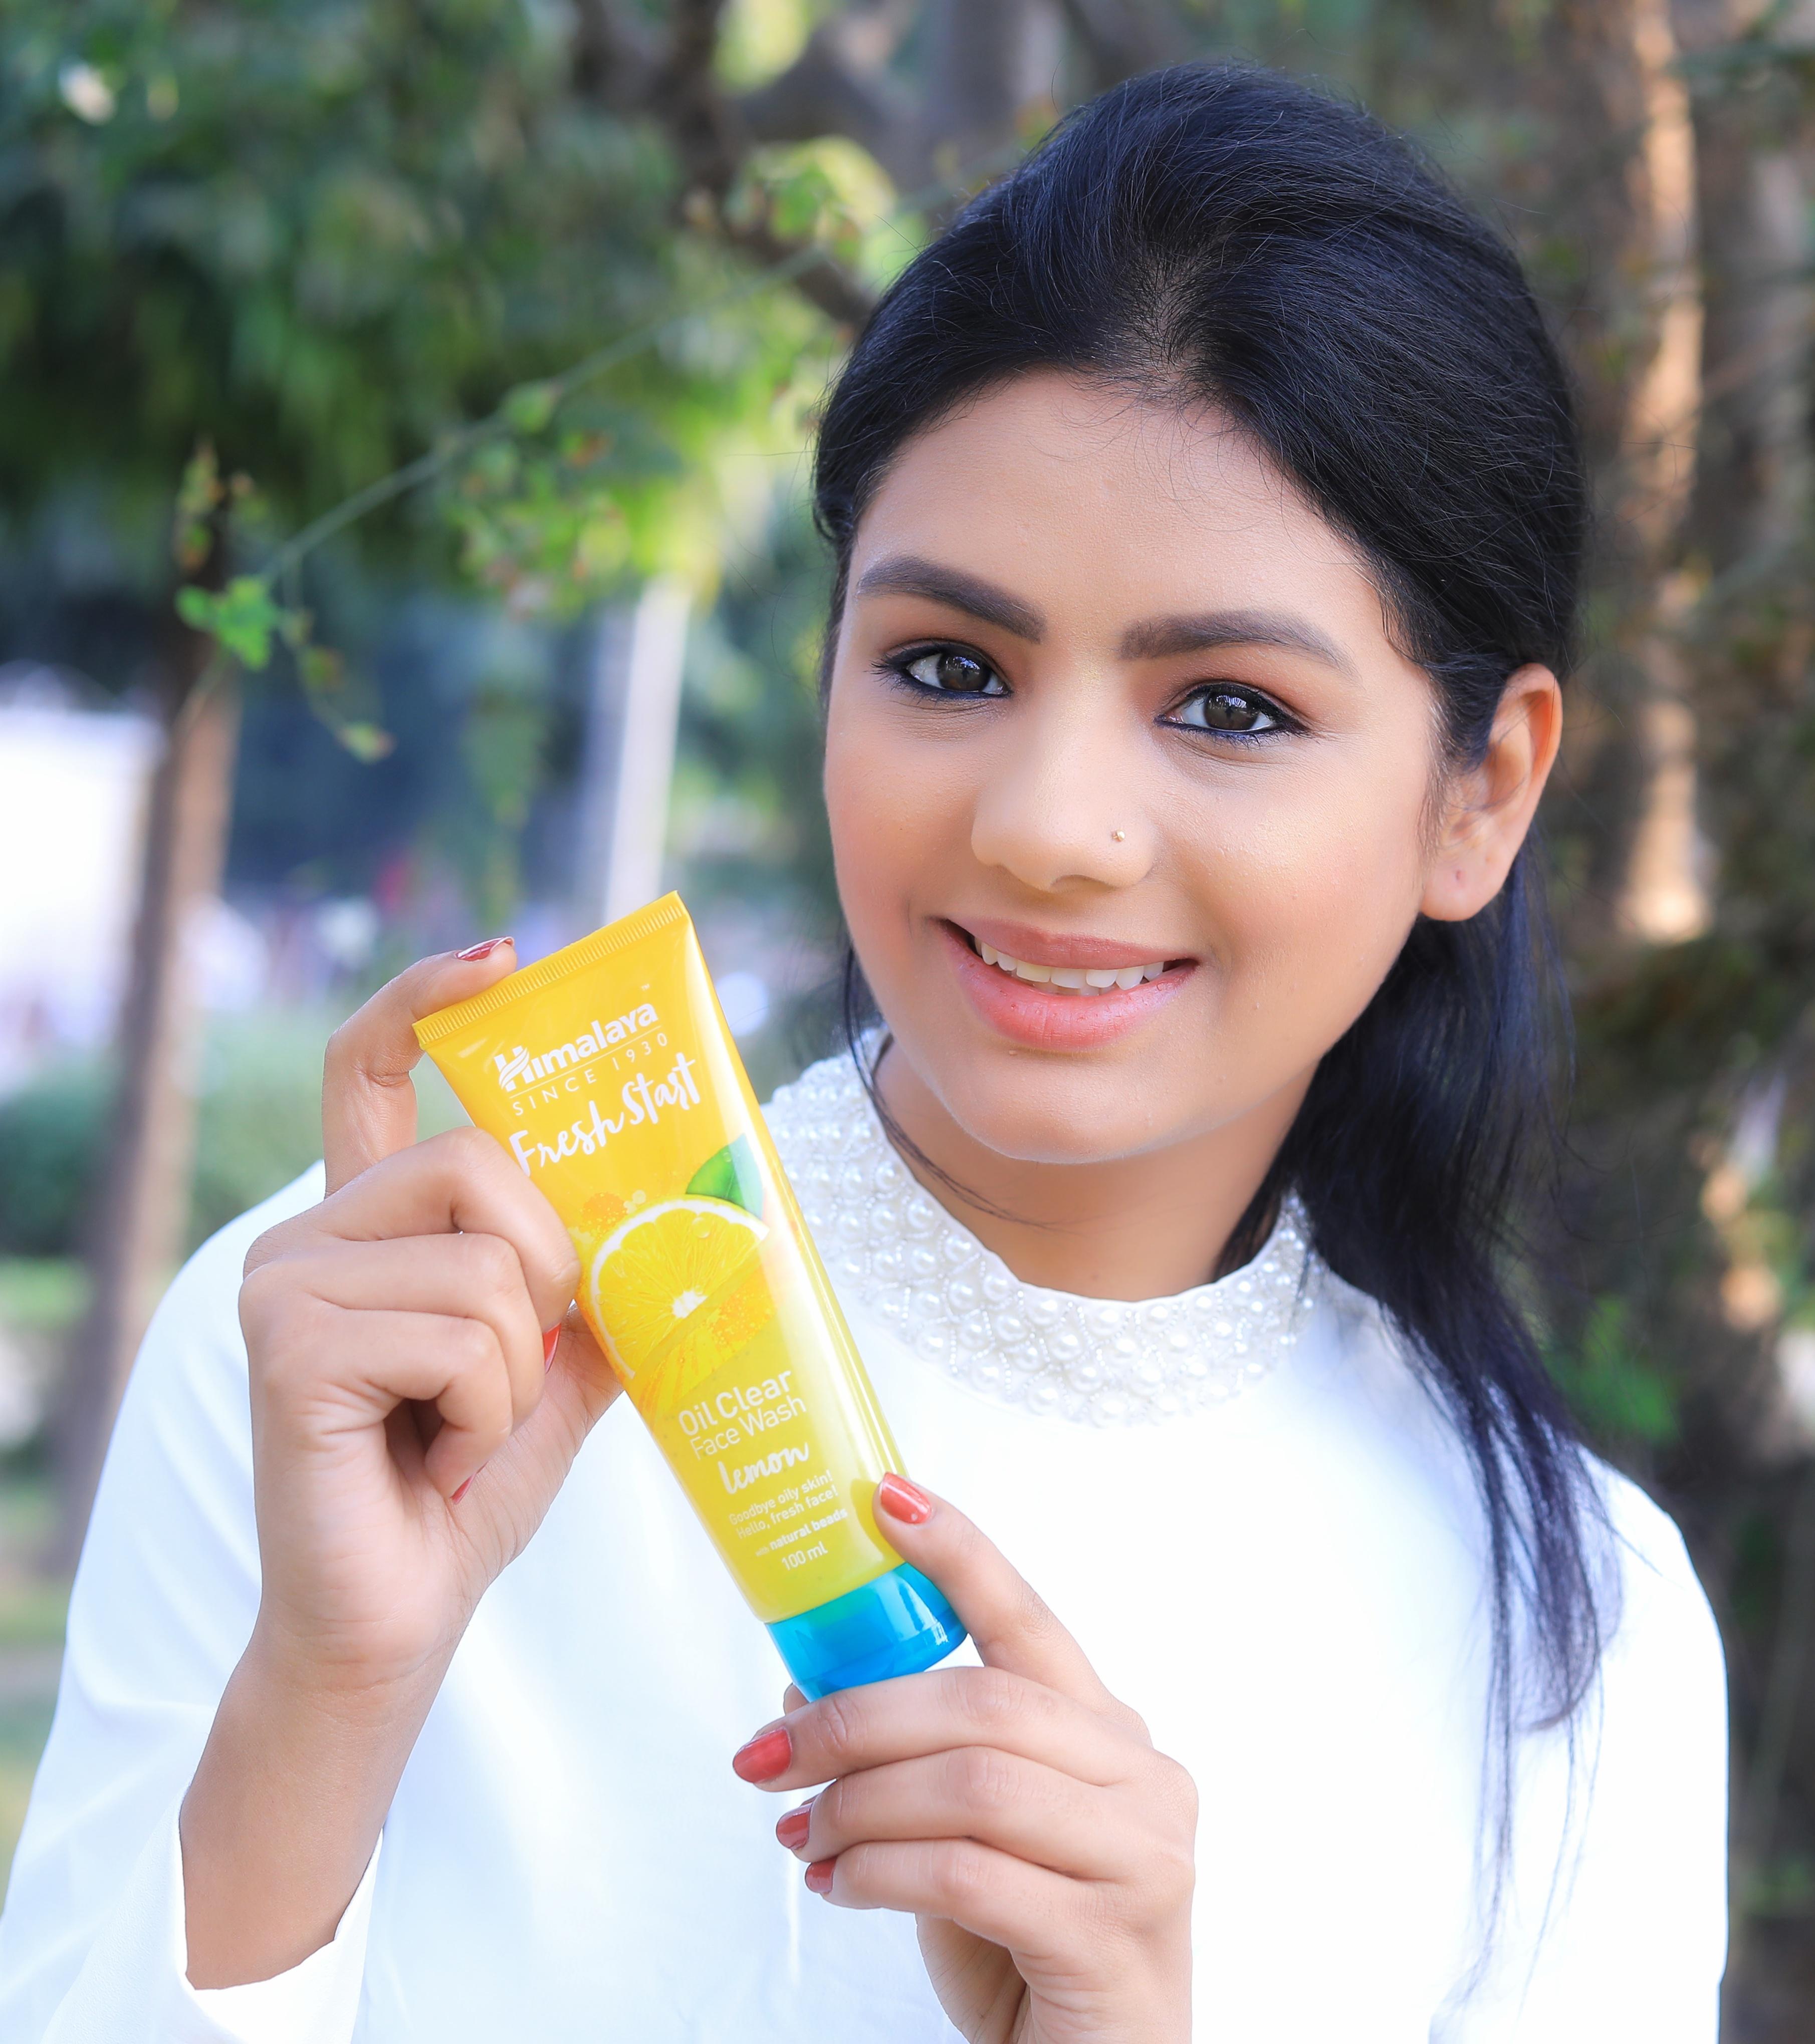 Himalaya Herbals Oil Clear Lemon Face Wash-Great-By nehakhatri